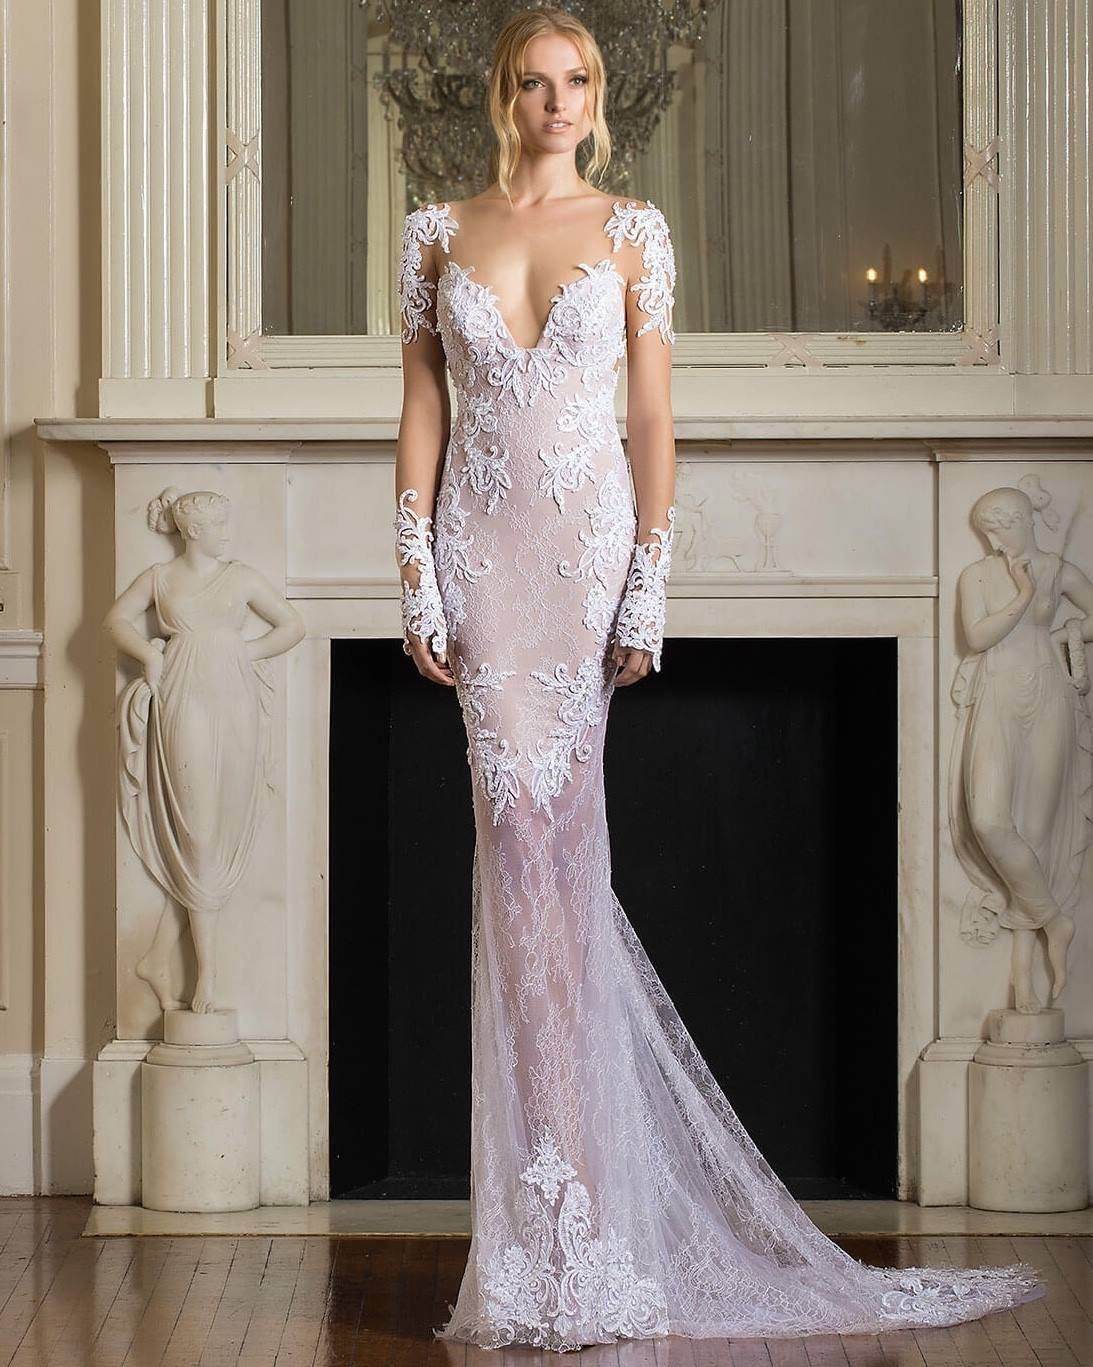 Pnina wedding dress  Pnina Tornai Wedding Dress  Wedding and Events  Pinterest